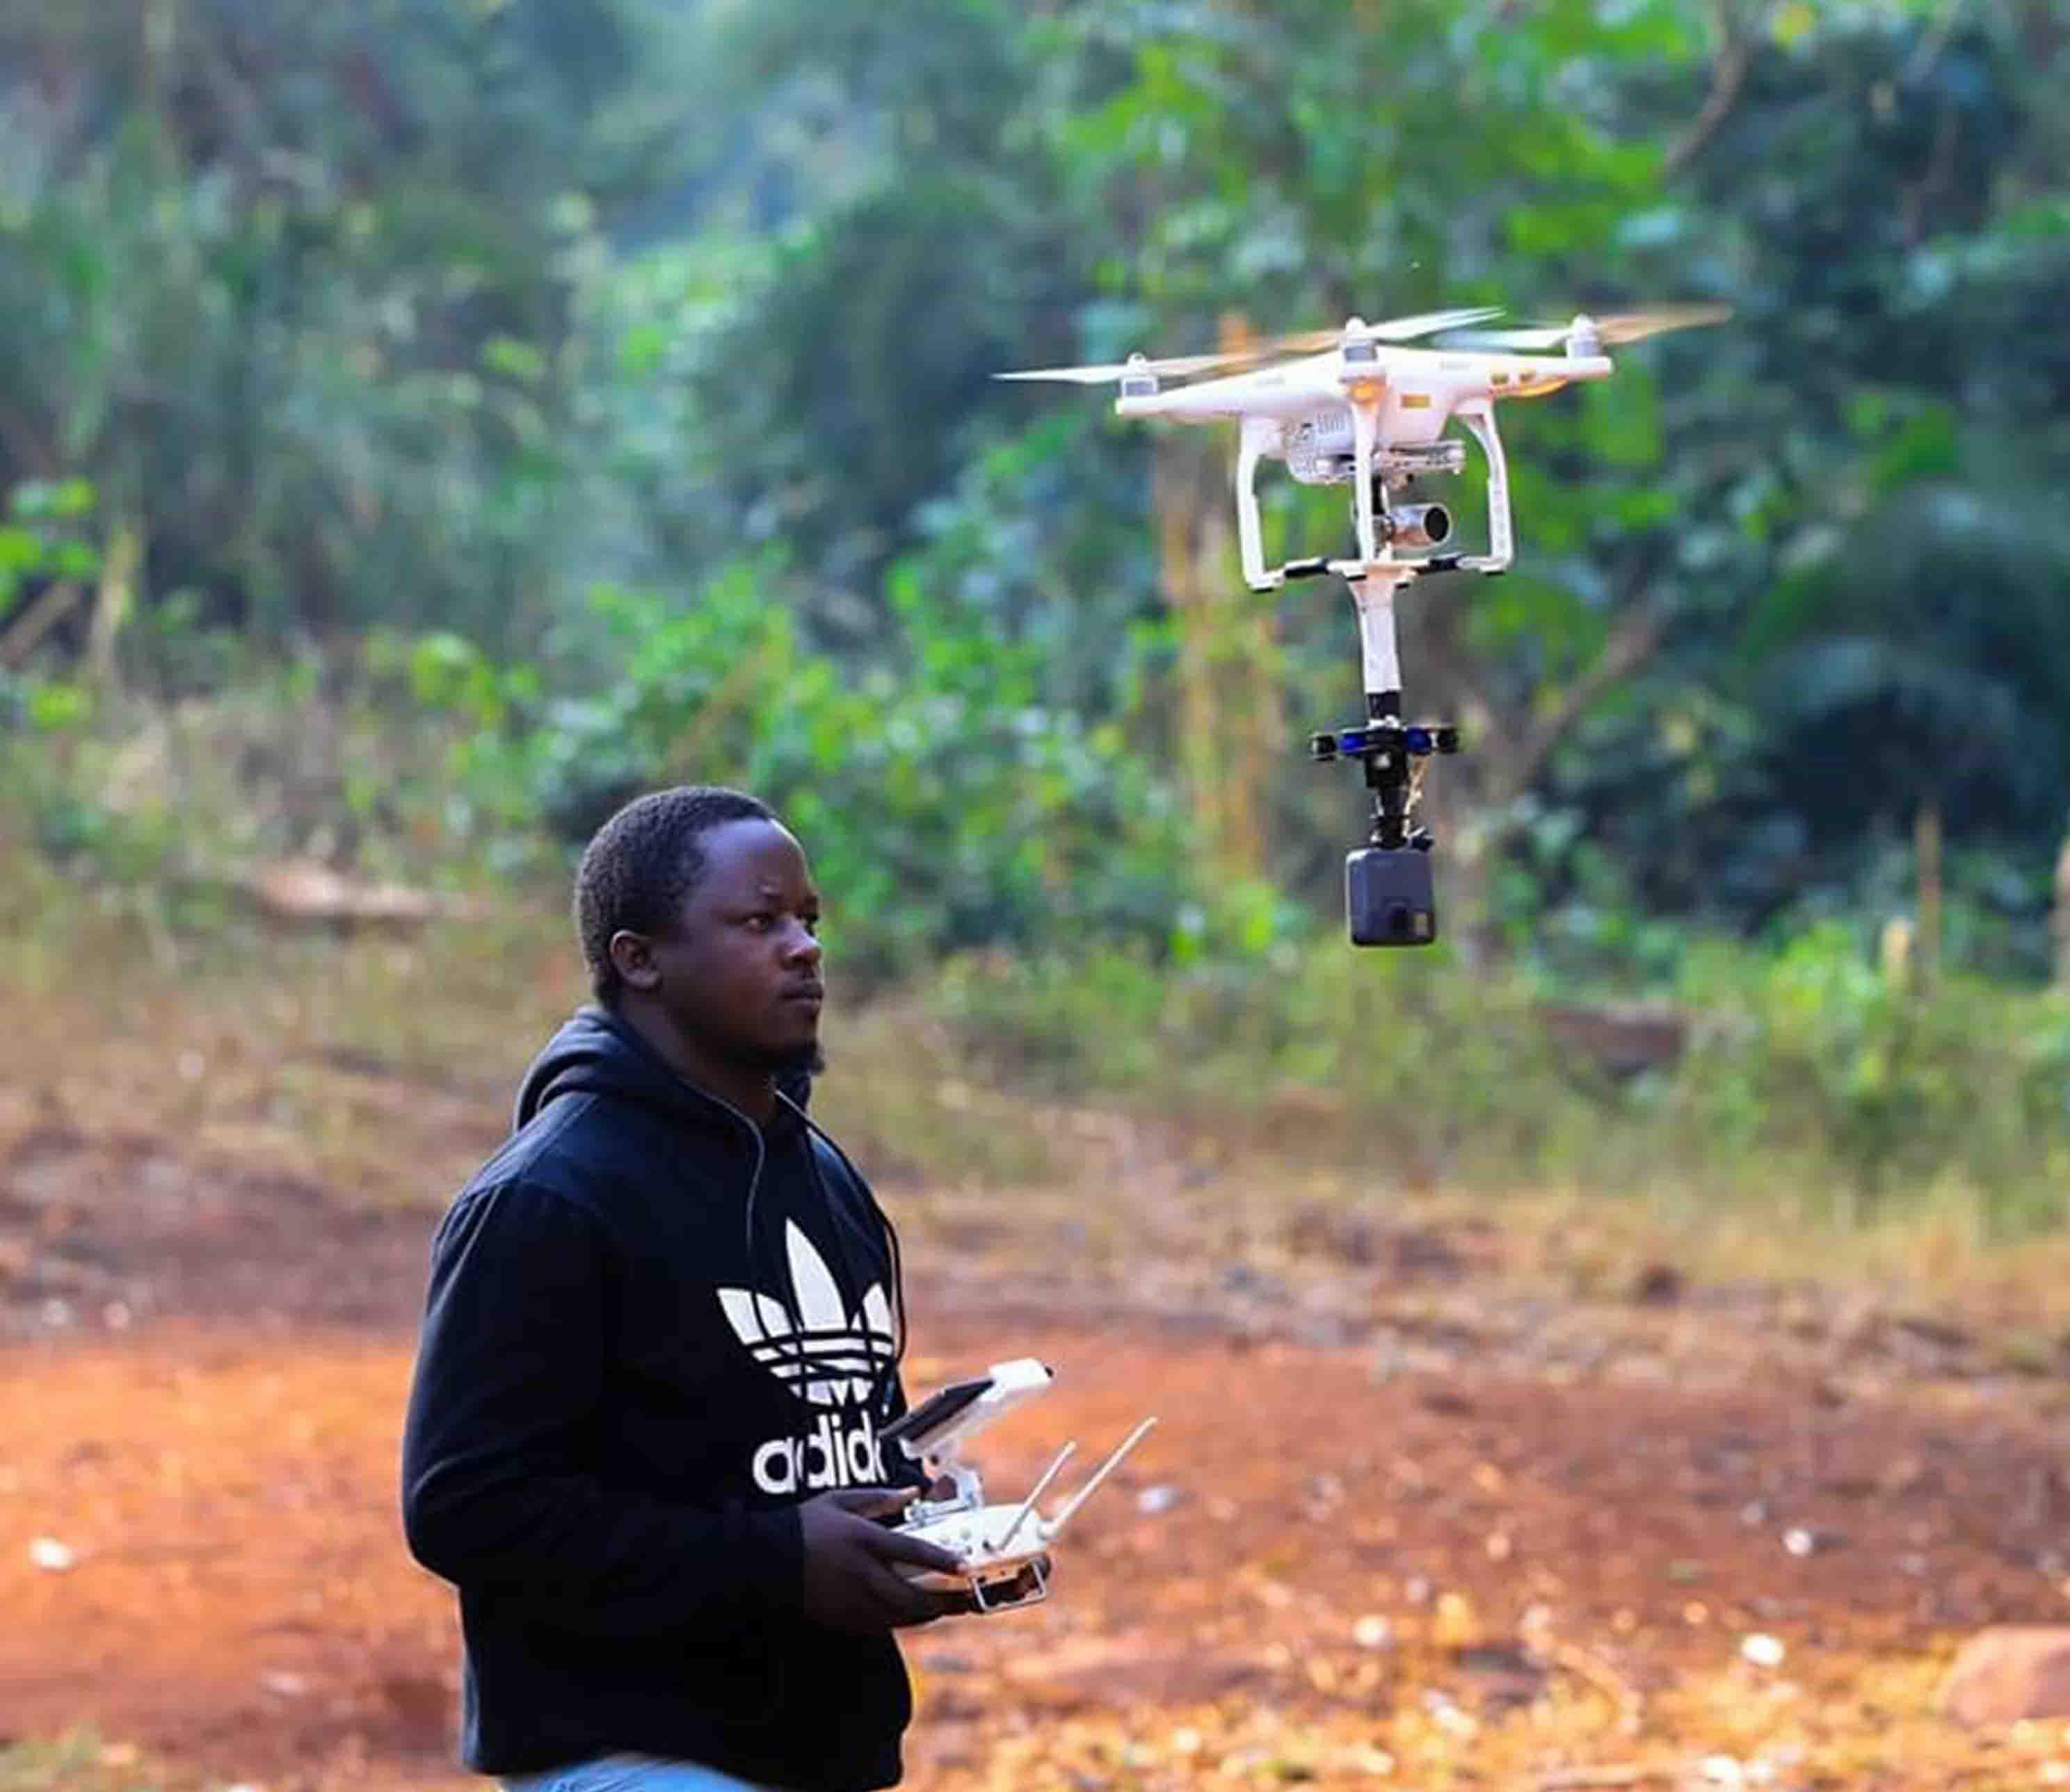 Film Crew Fixer, hiring drones in Uganda